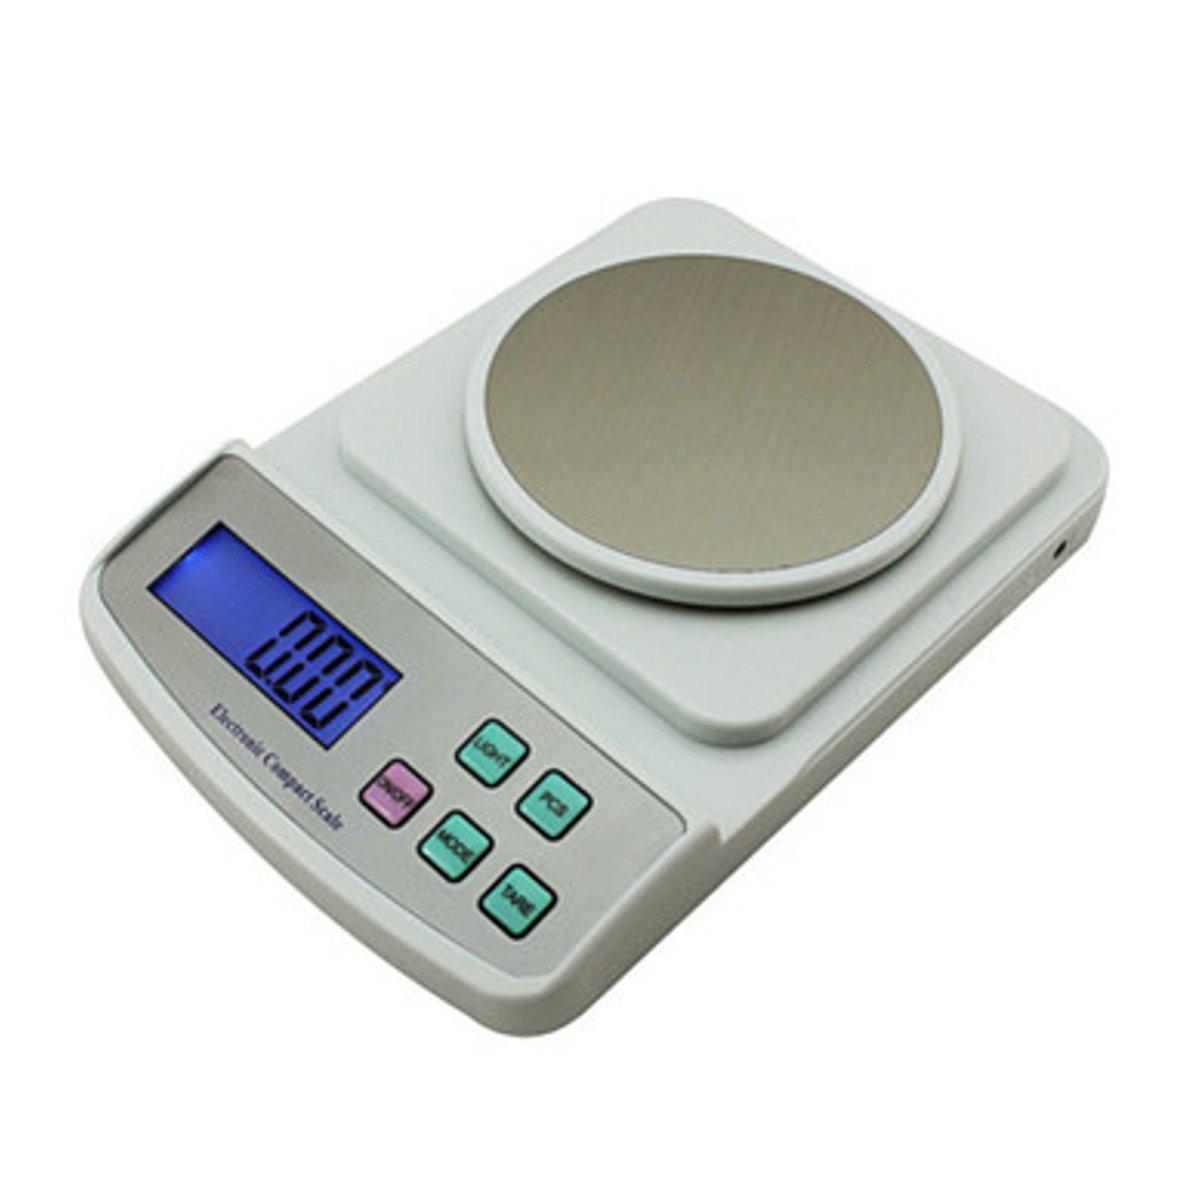 500g//0.01g US Electronic Jewelry Balance Scale High Precision Digital Display